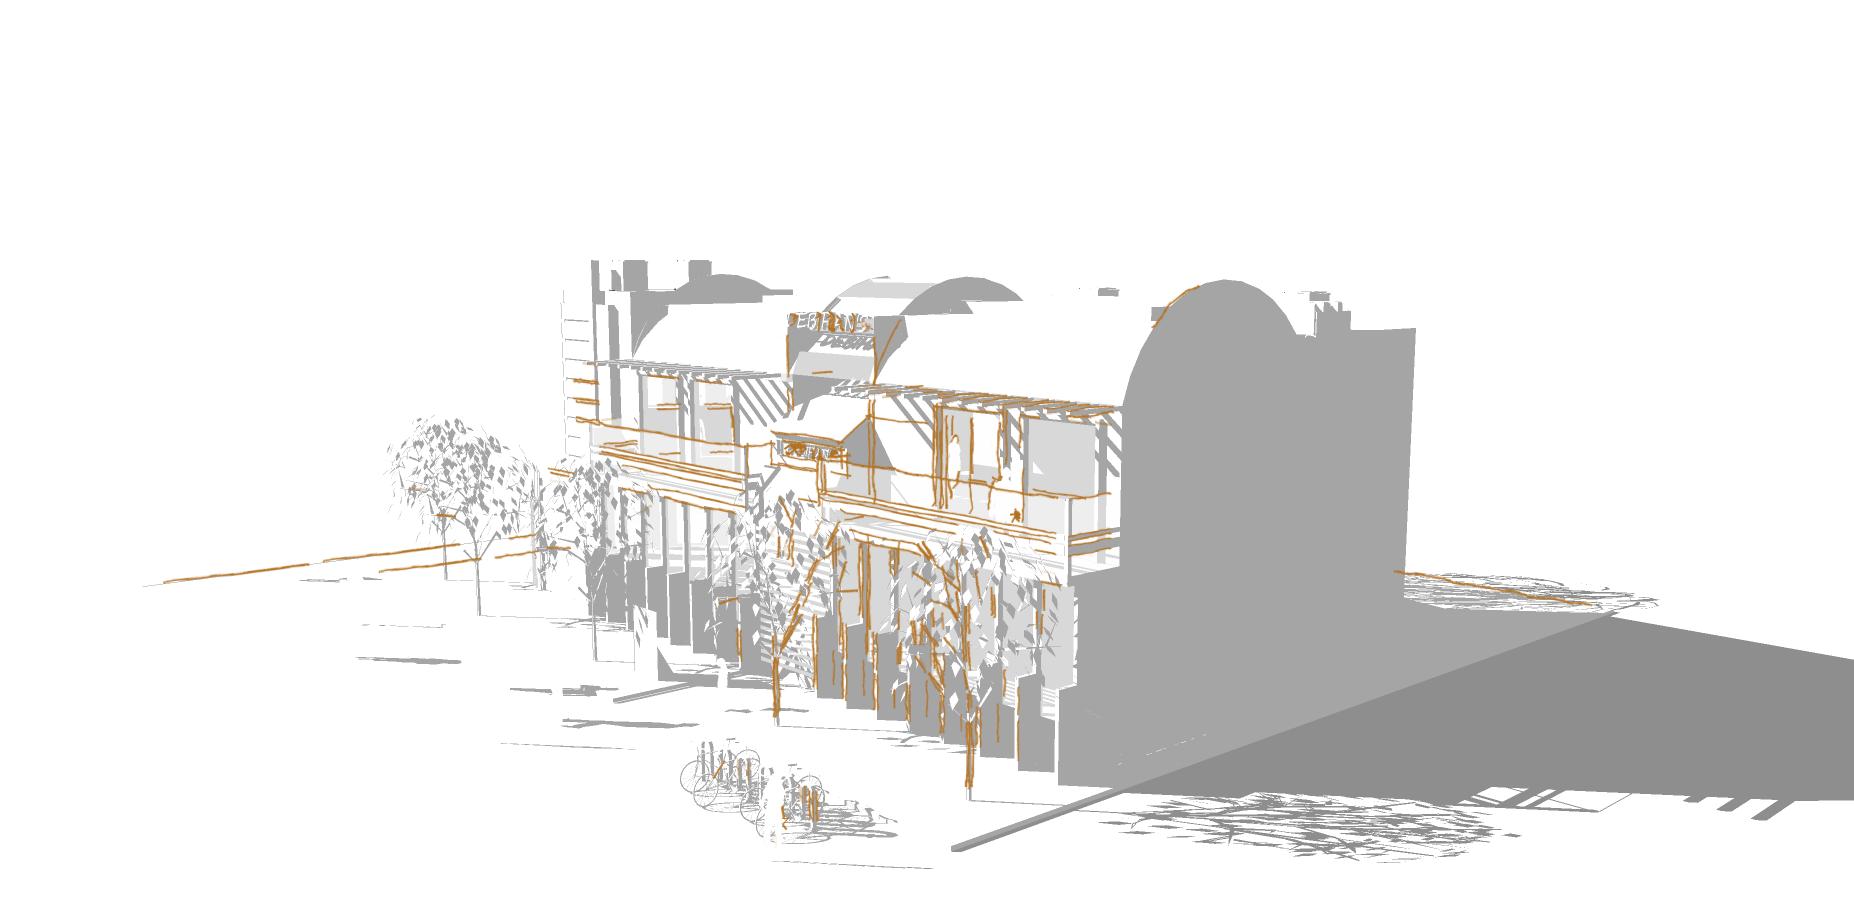 SketchUp'eur architecte -AnthO'- - Page 4 Debian10